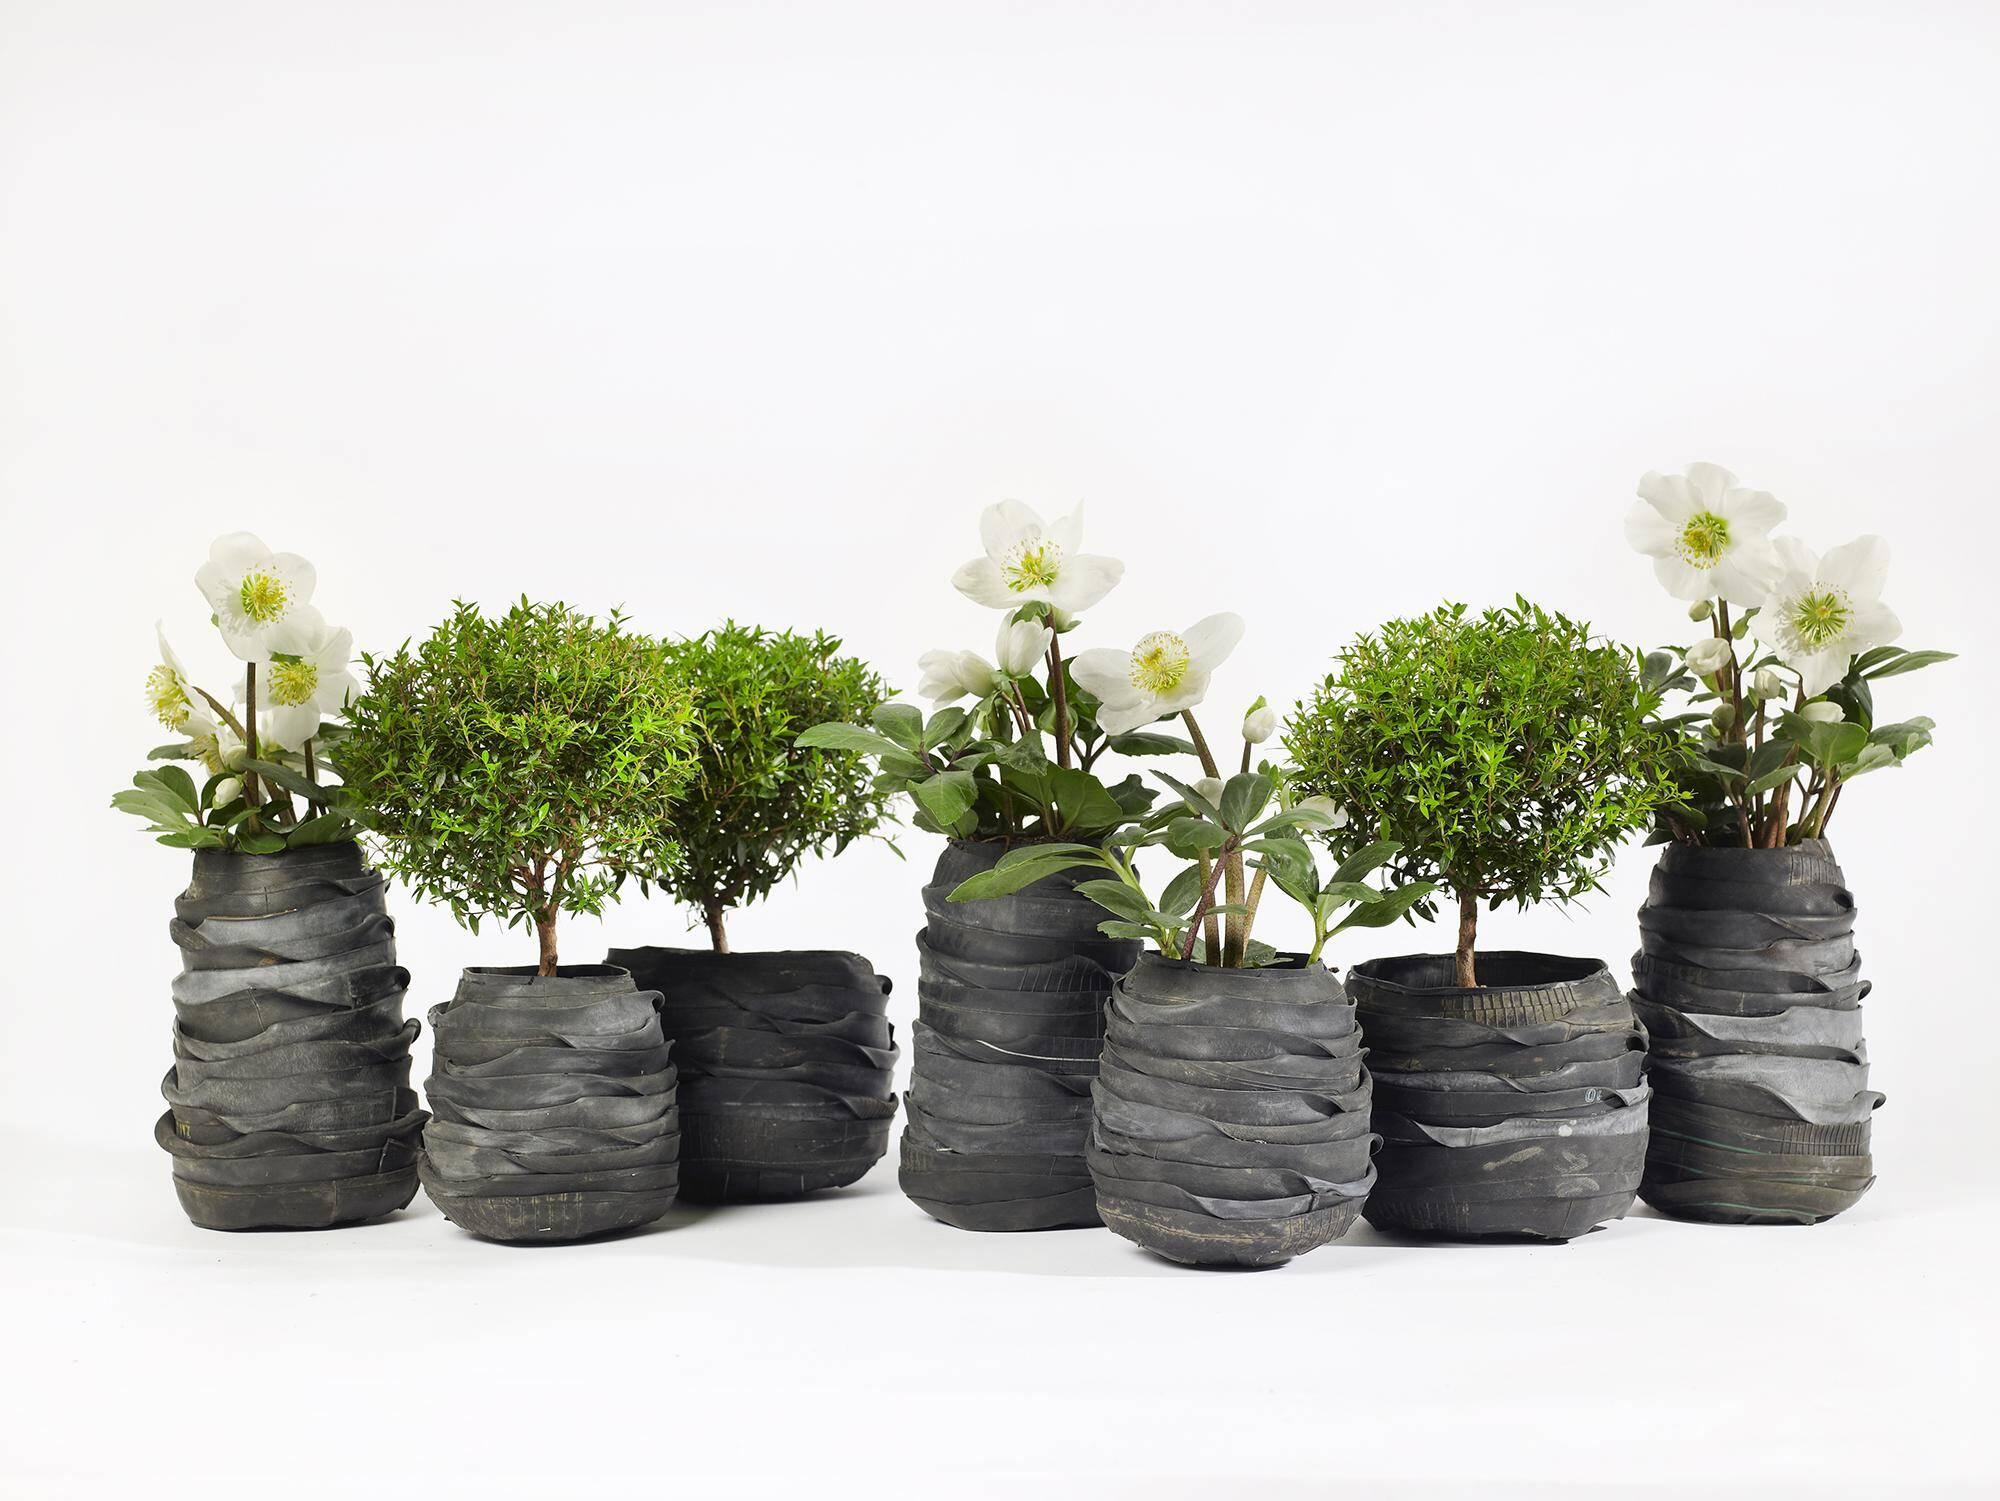 Serax - Flower pots can transform any garden or interior (4)